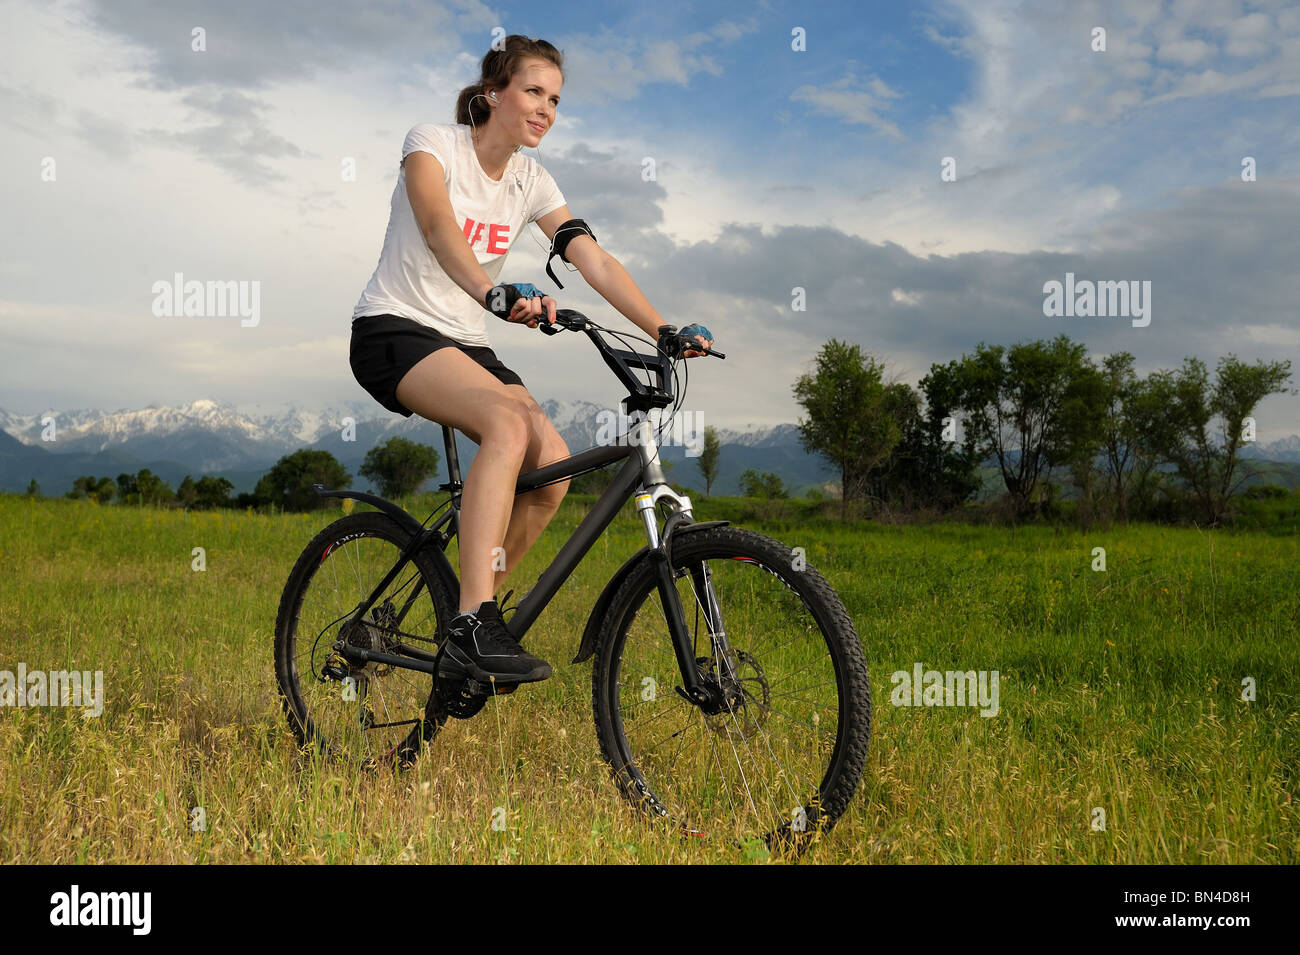 Girl riding a bike - Stock Image